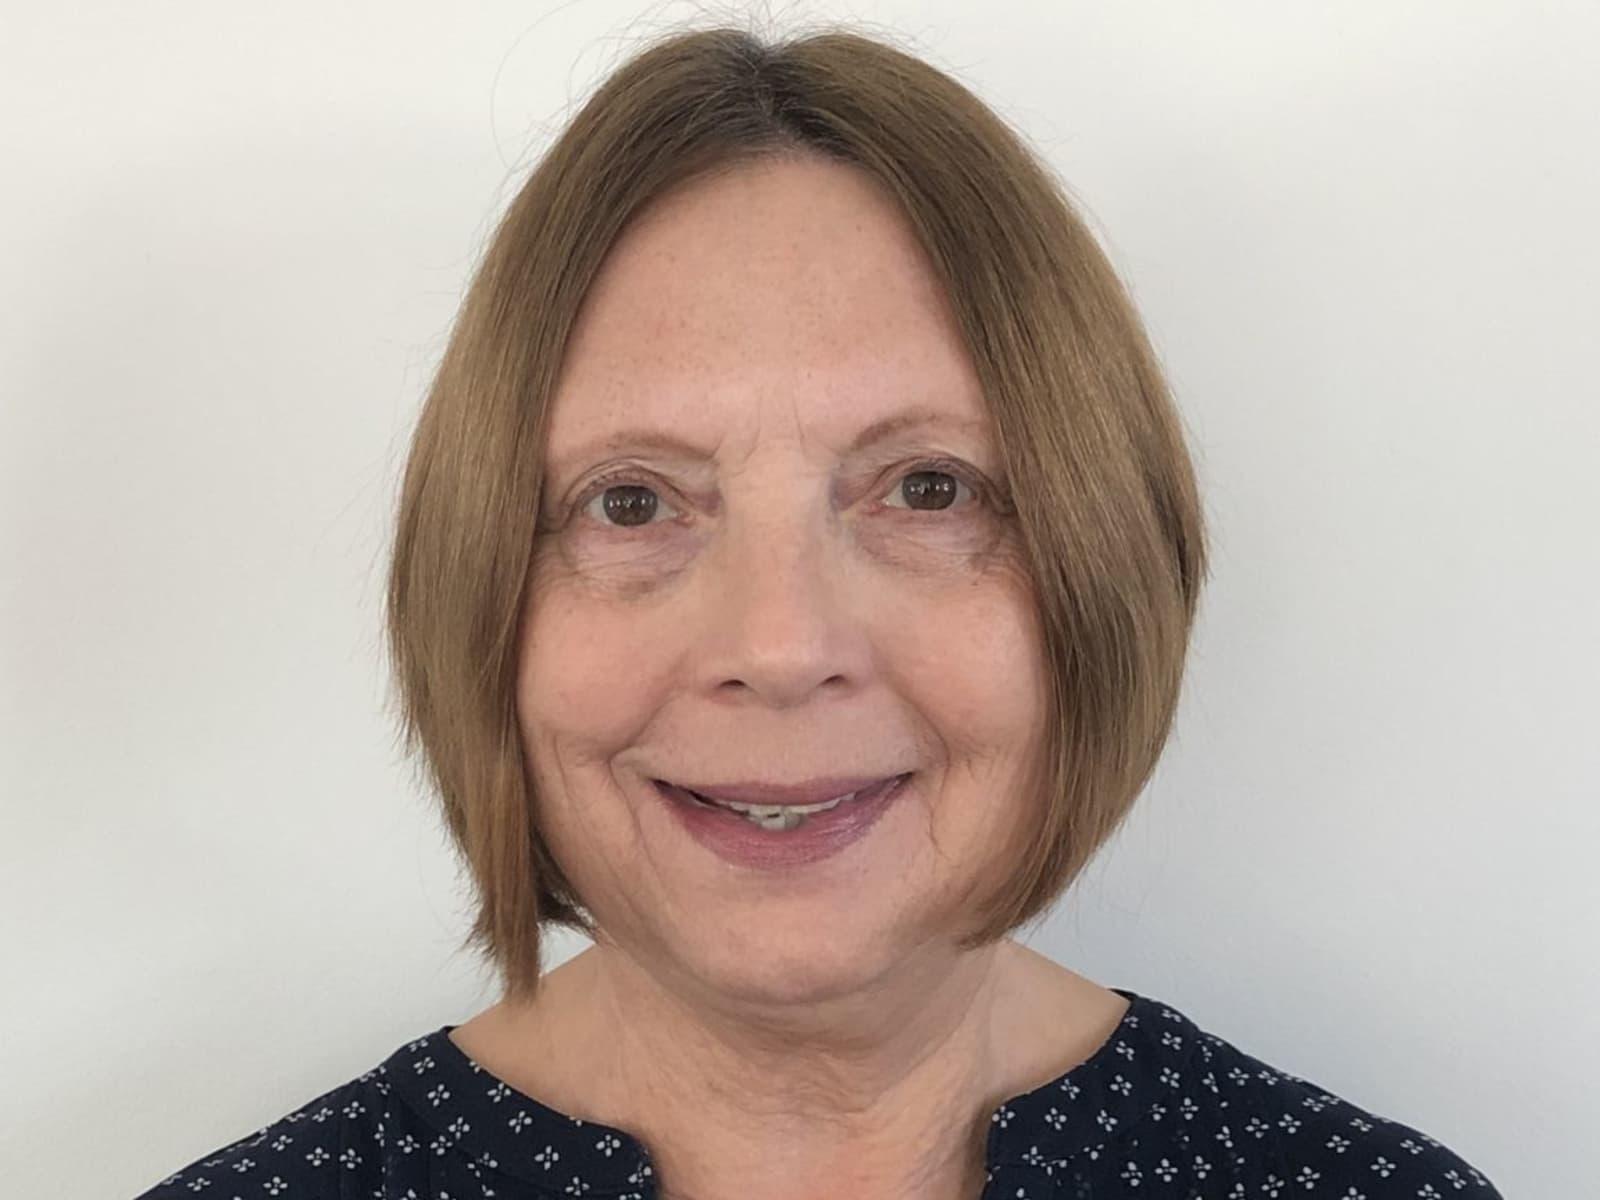 Diane from Grand Rapids, Michigan, United States